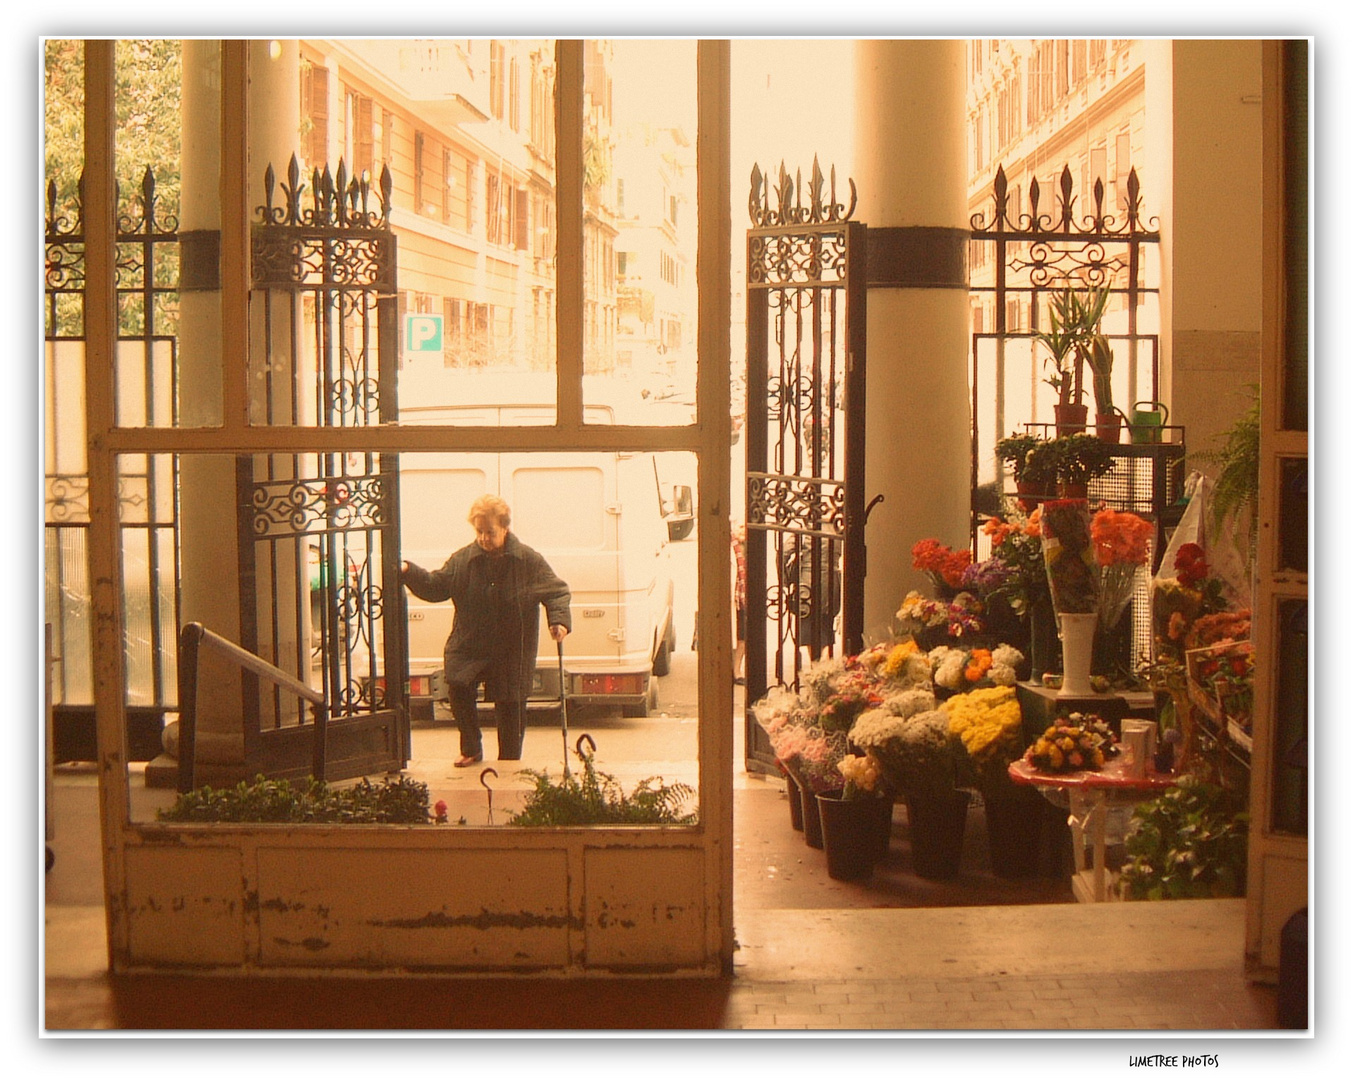 A Market near Via Germanico